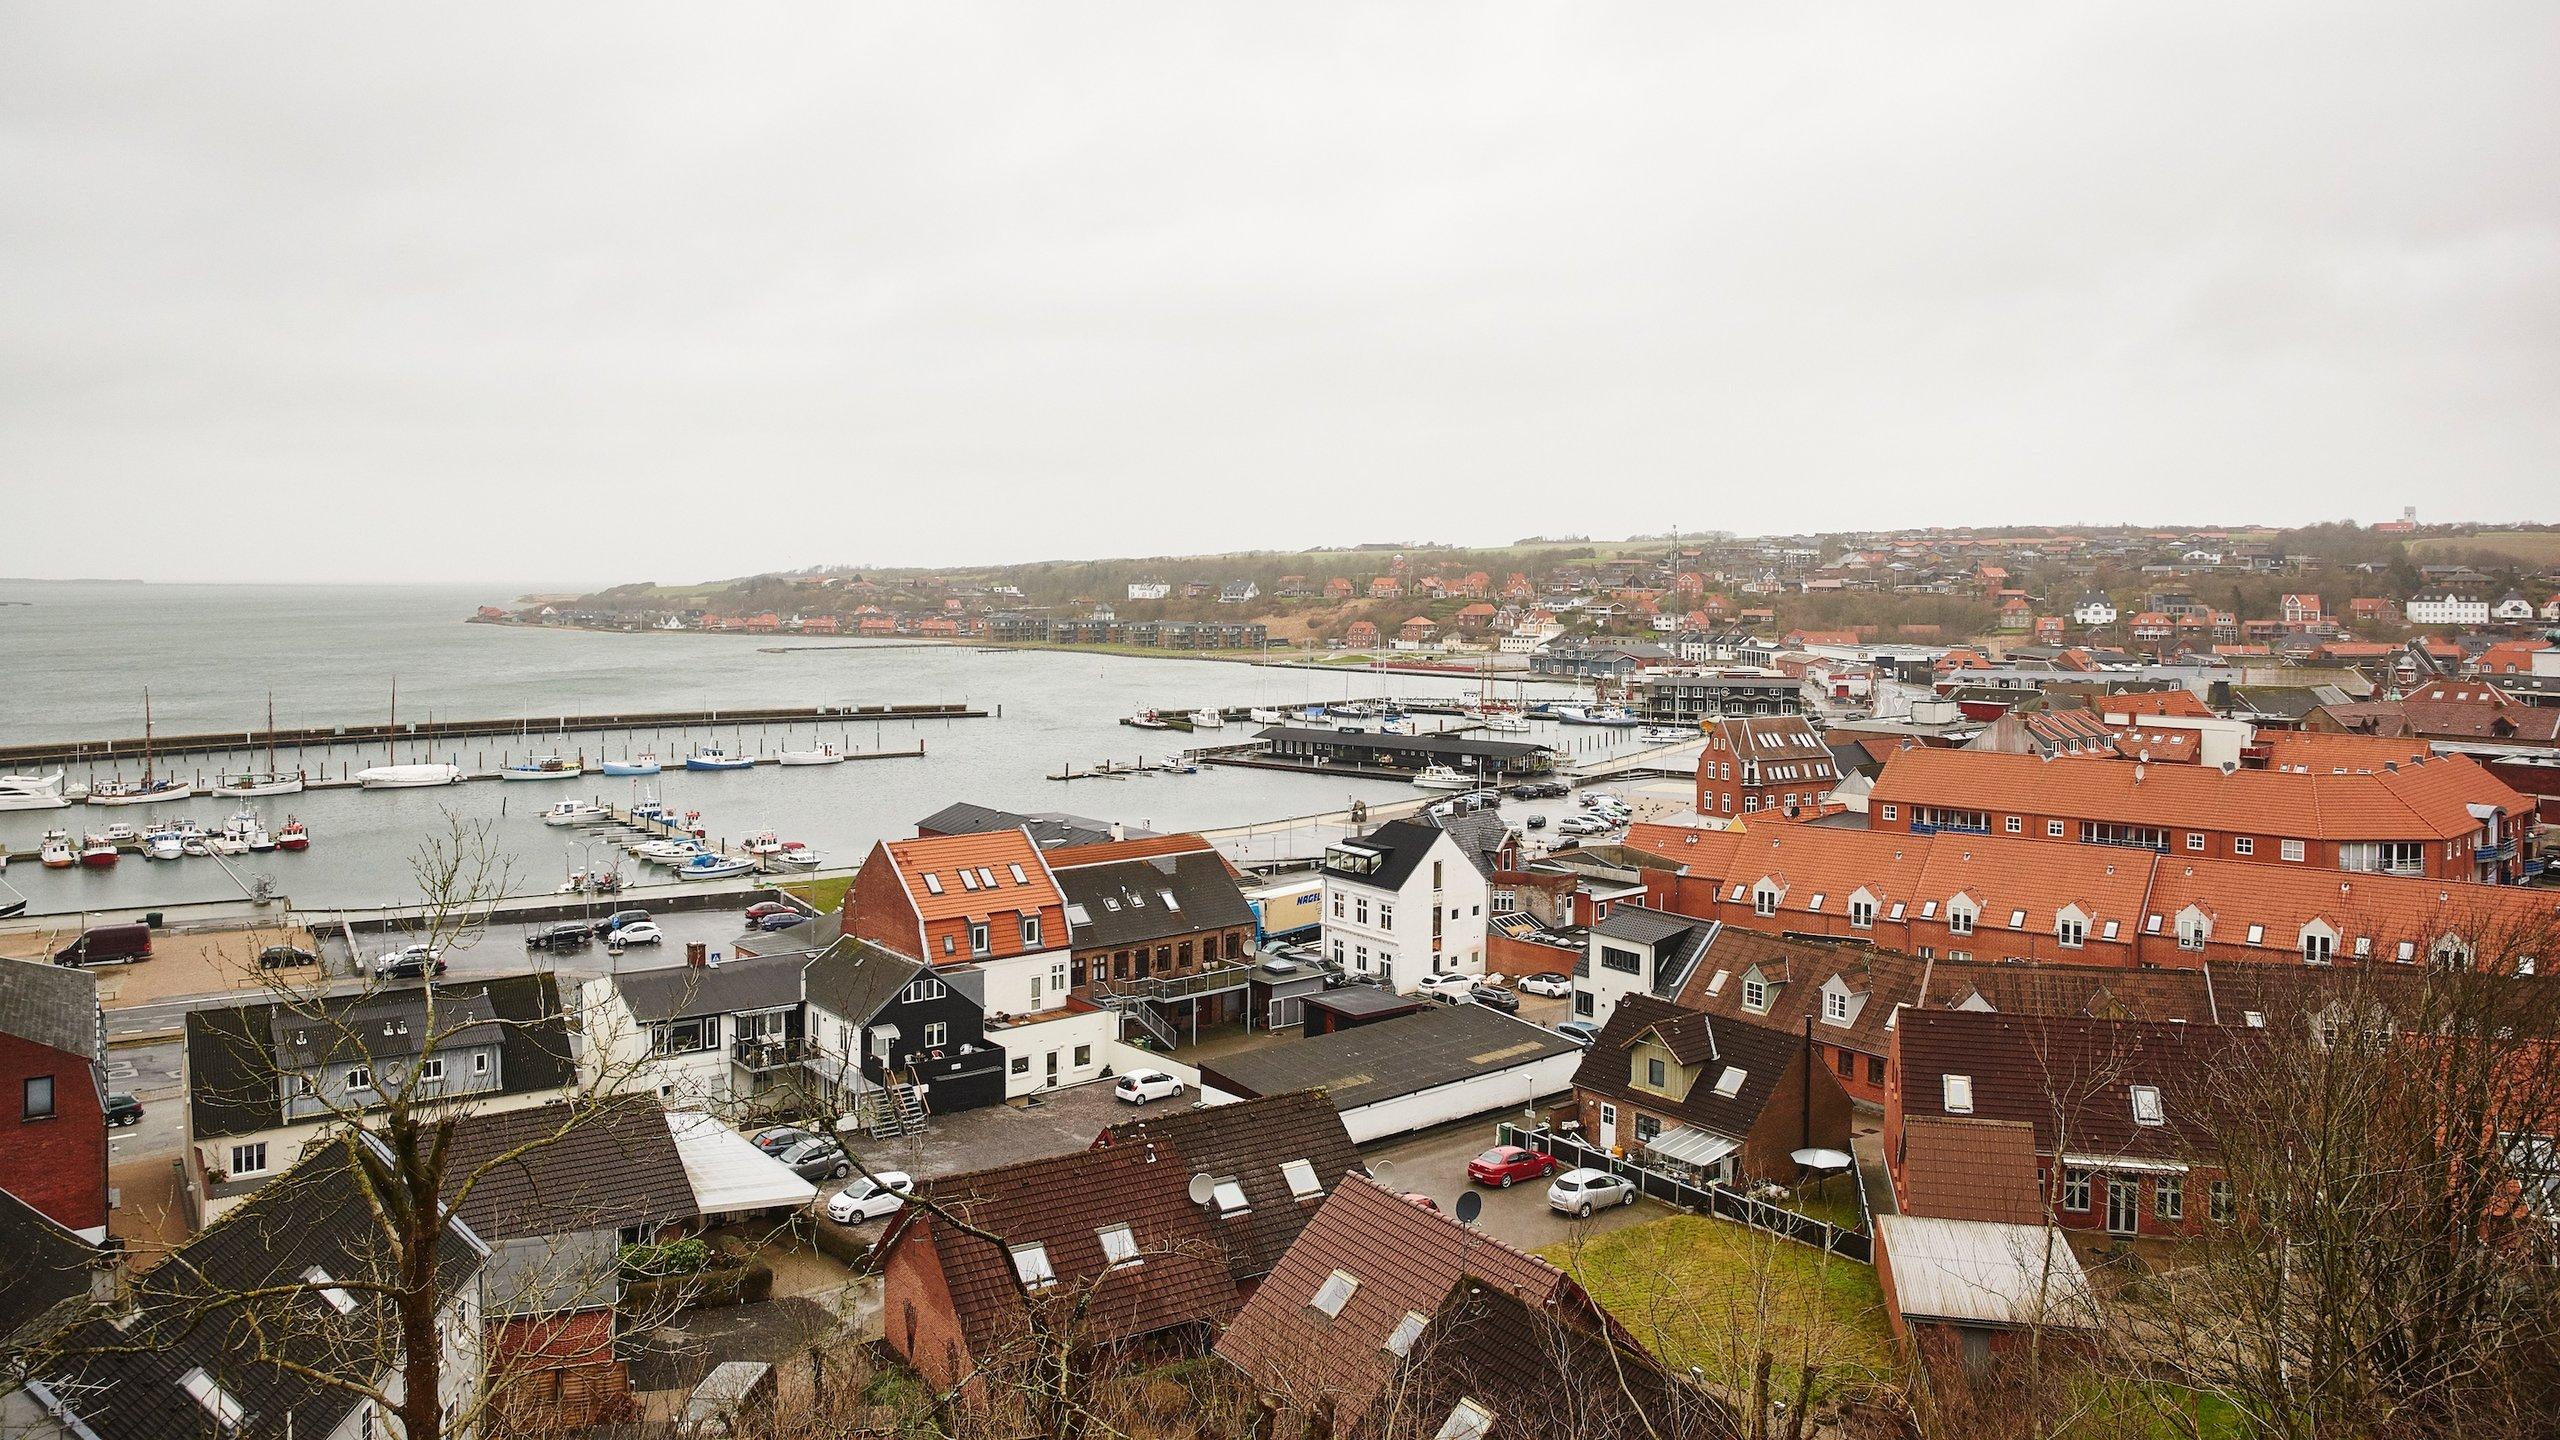 Lemvig Municipality, Midtjylland, Denmark